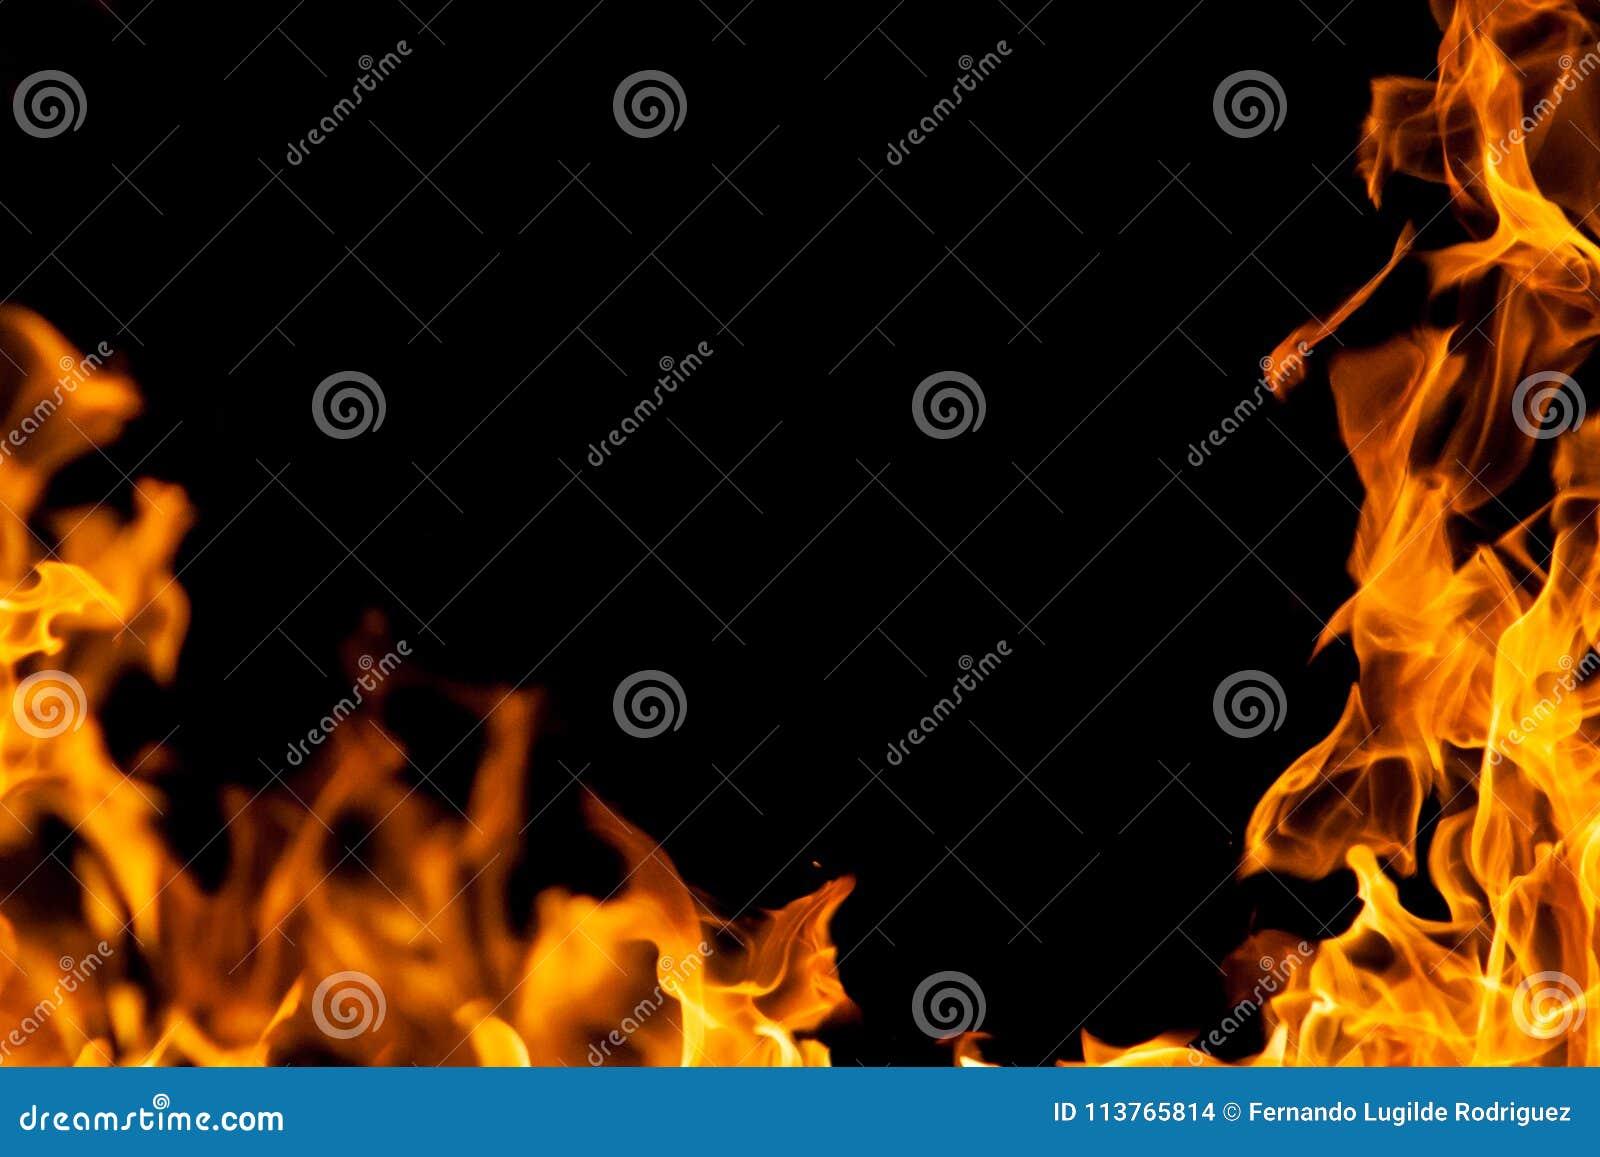 Feuerrahmen in der Dunkelheit